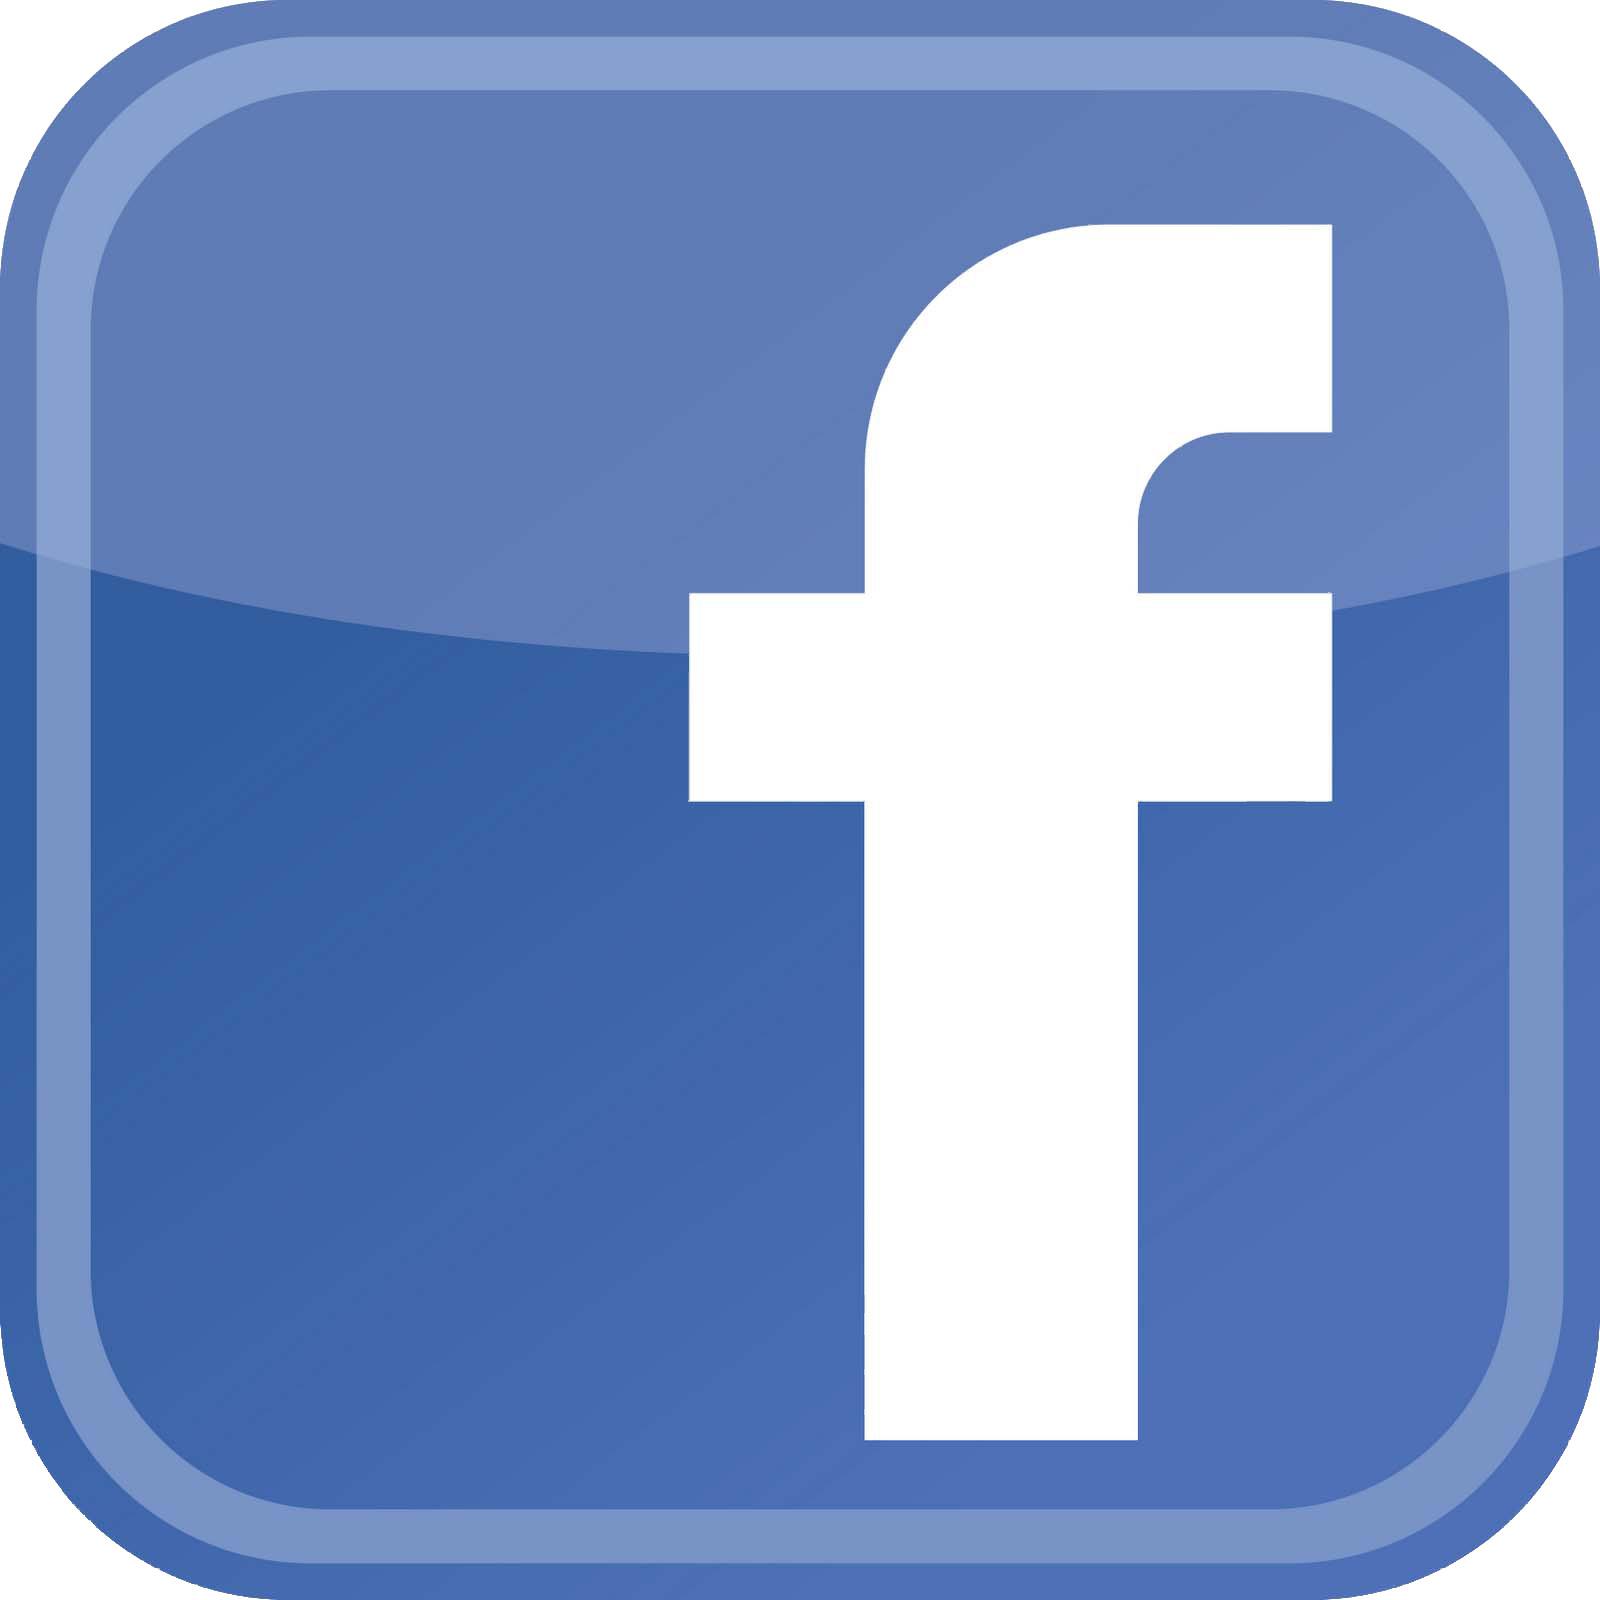 ChildSafeNet Facebook Page